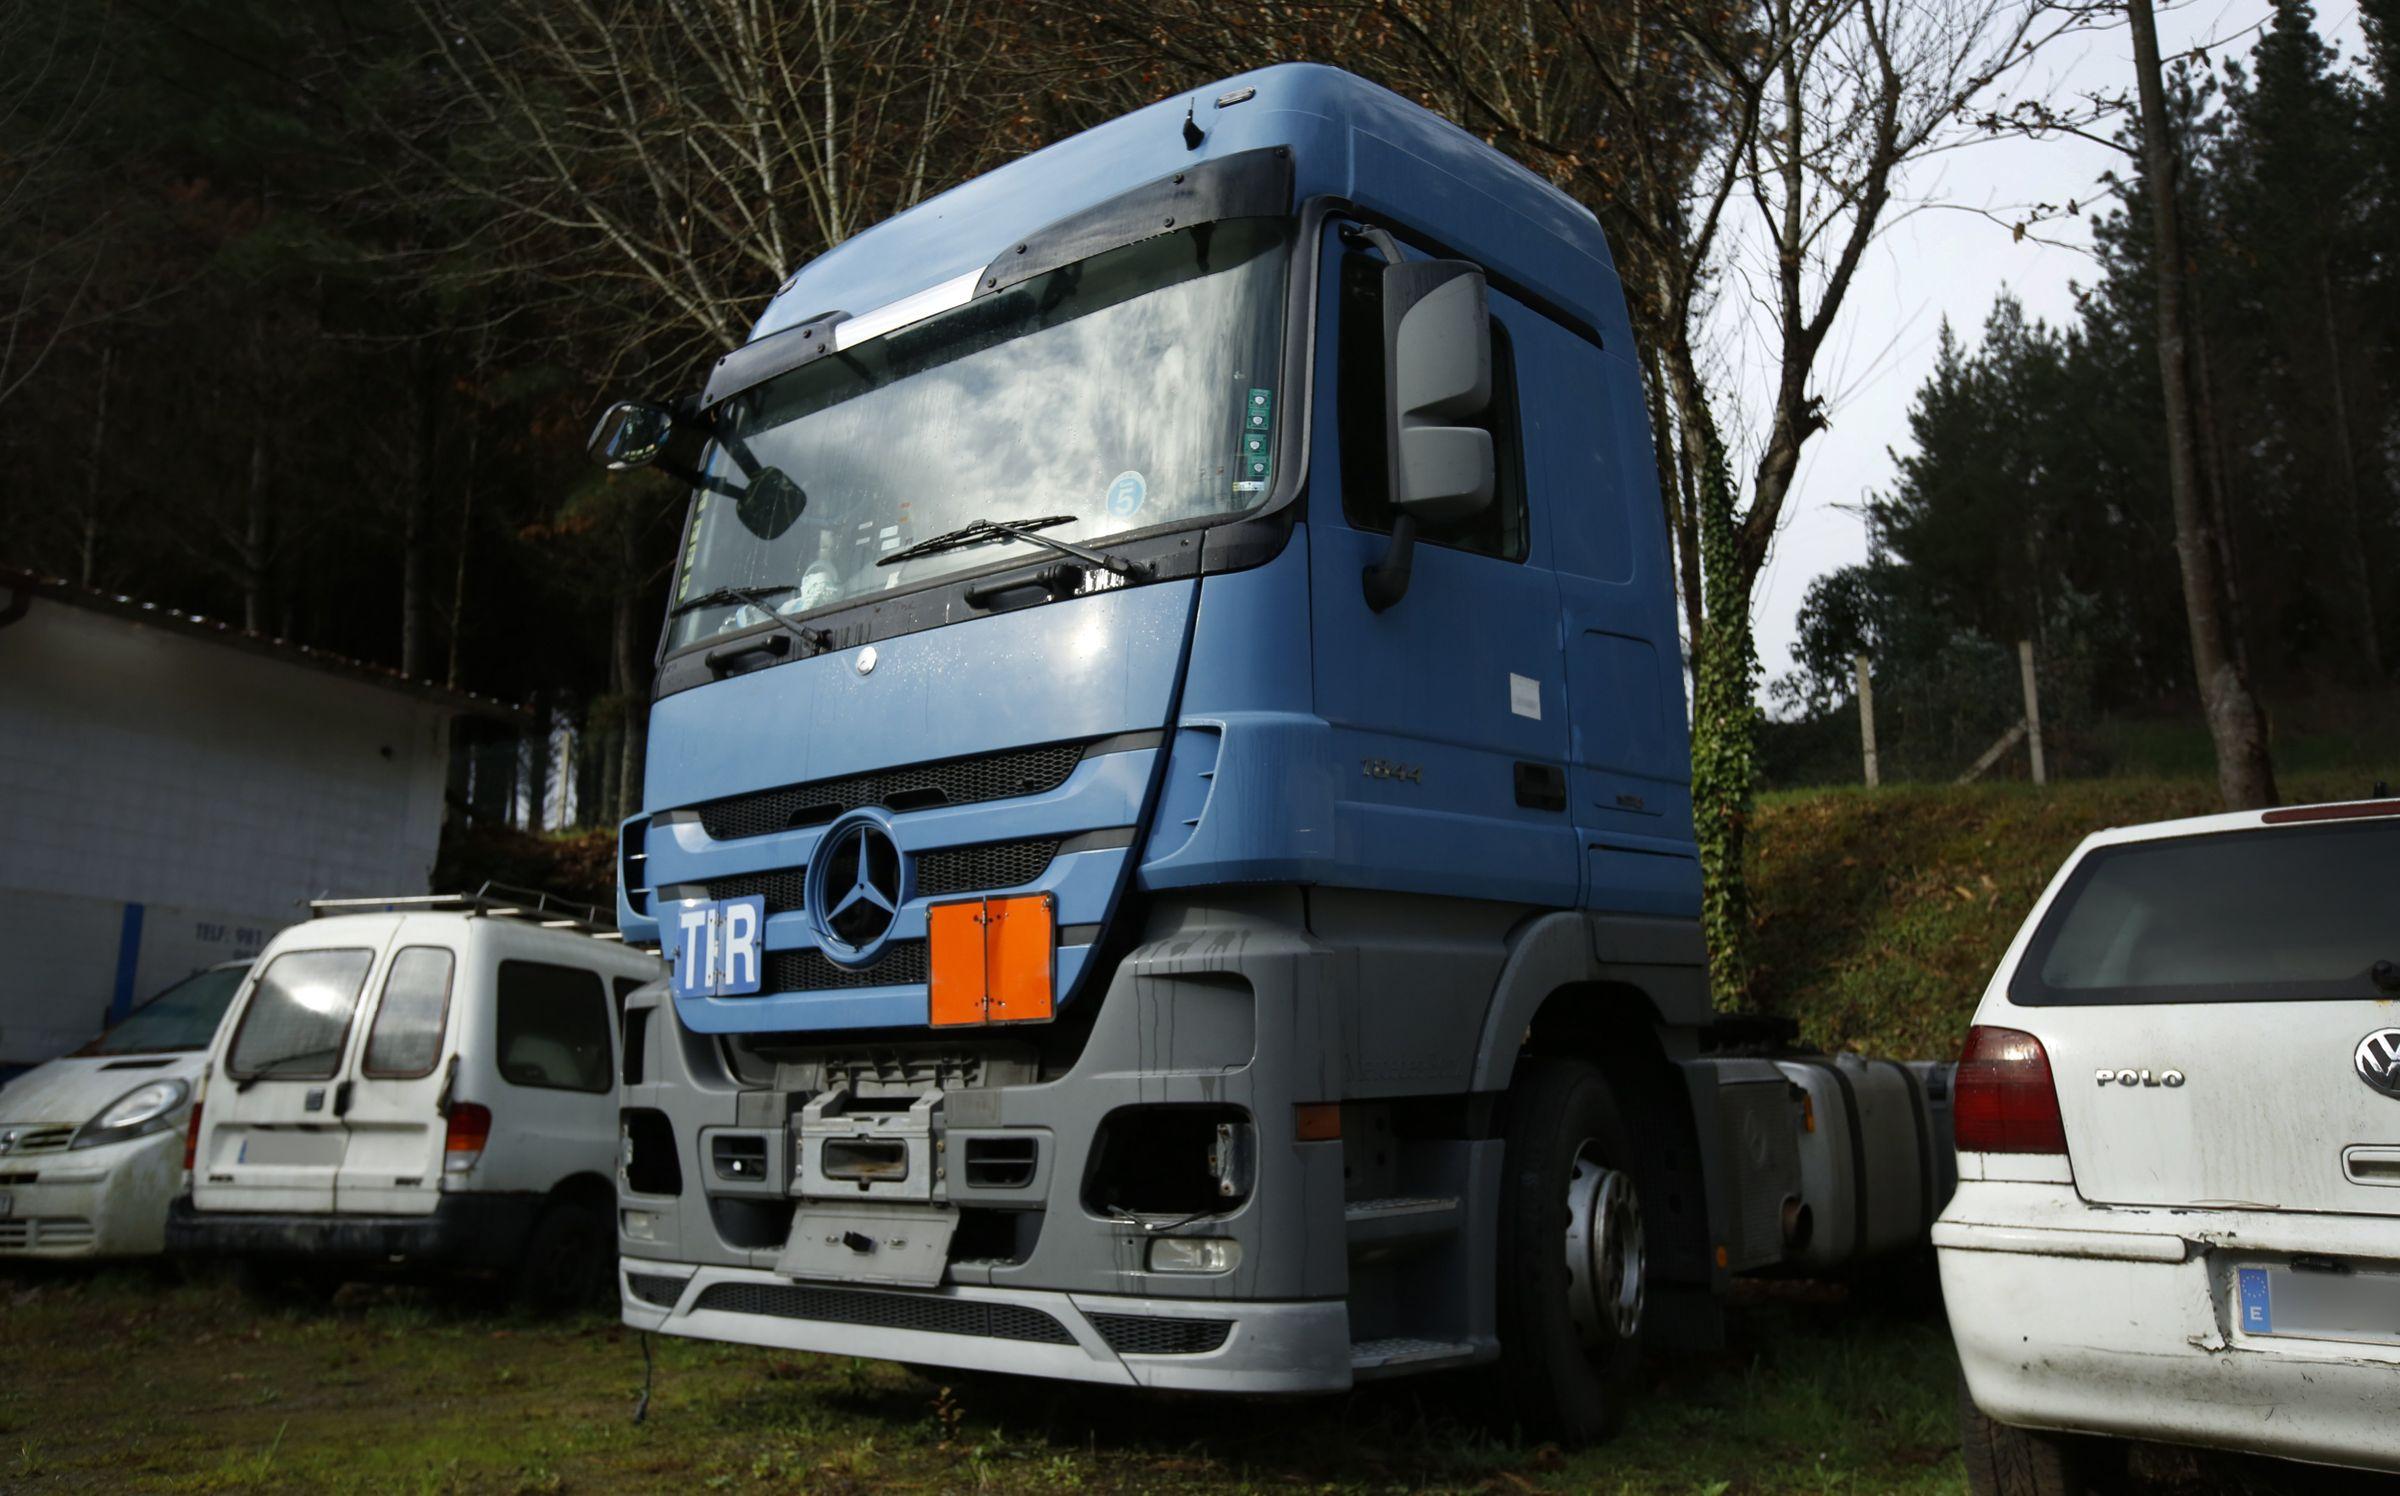 Este camión, usado para traer un alijo de heroína desde Bulgaria, se subastará